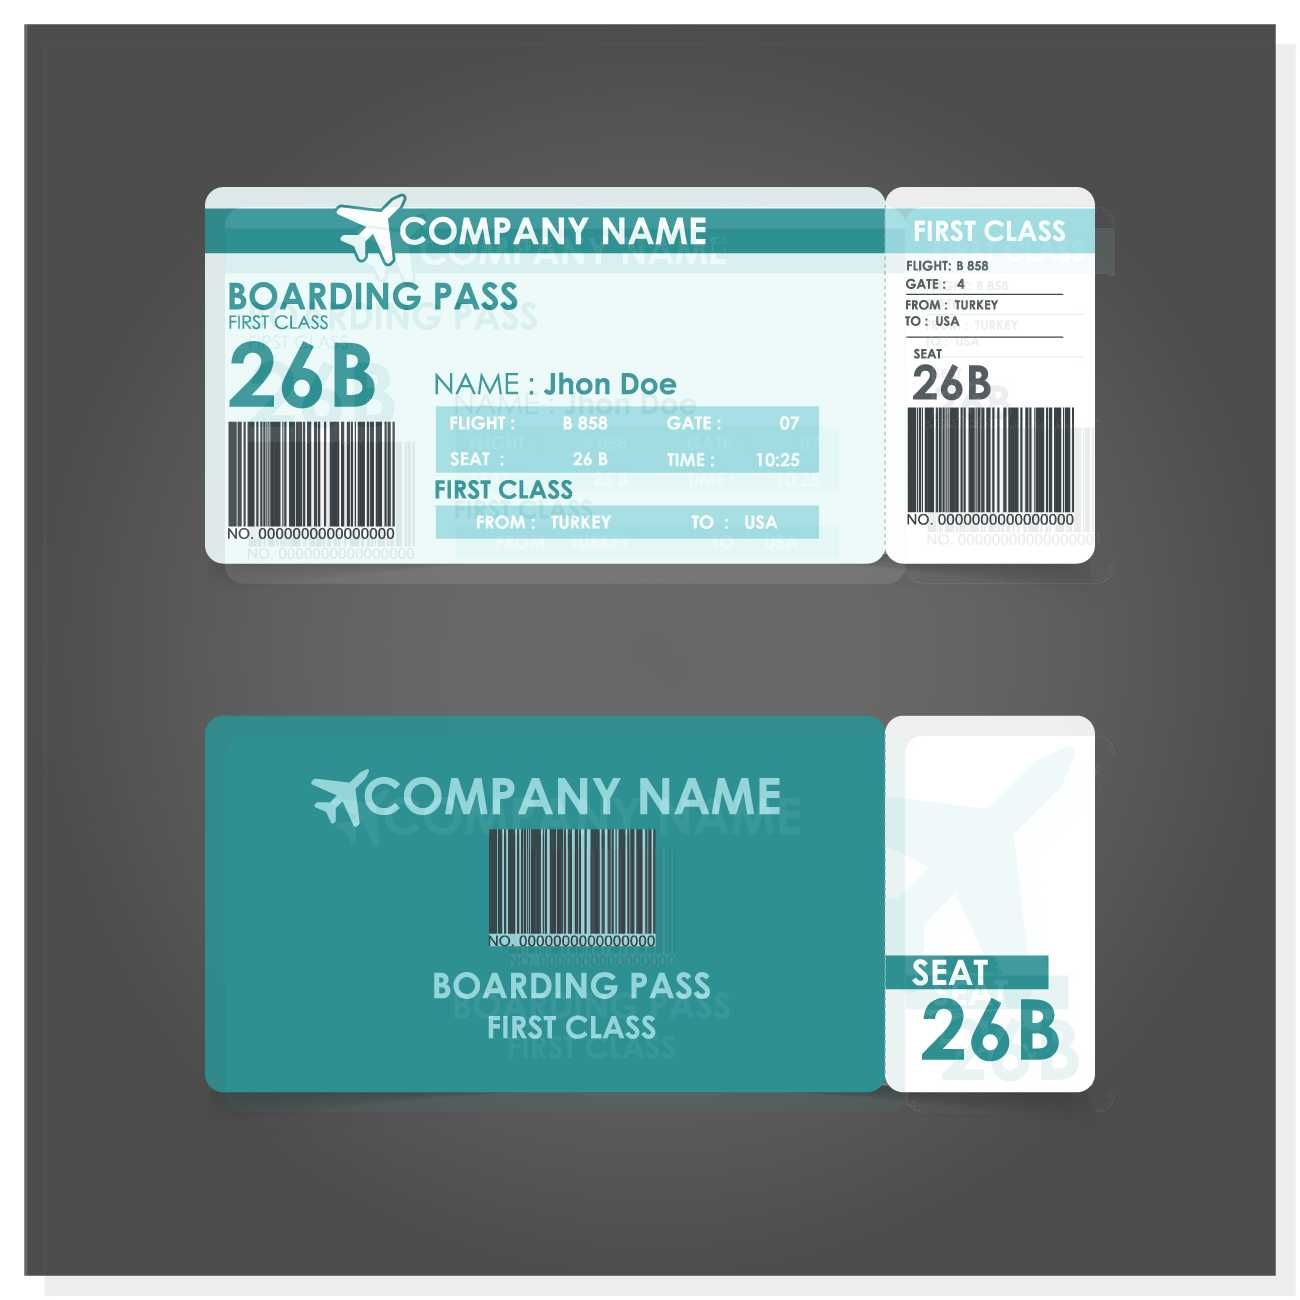 Boarding Pass Template - FREE | Print Templates | Pinterest ...